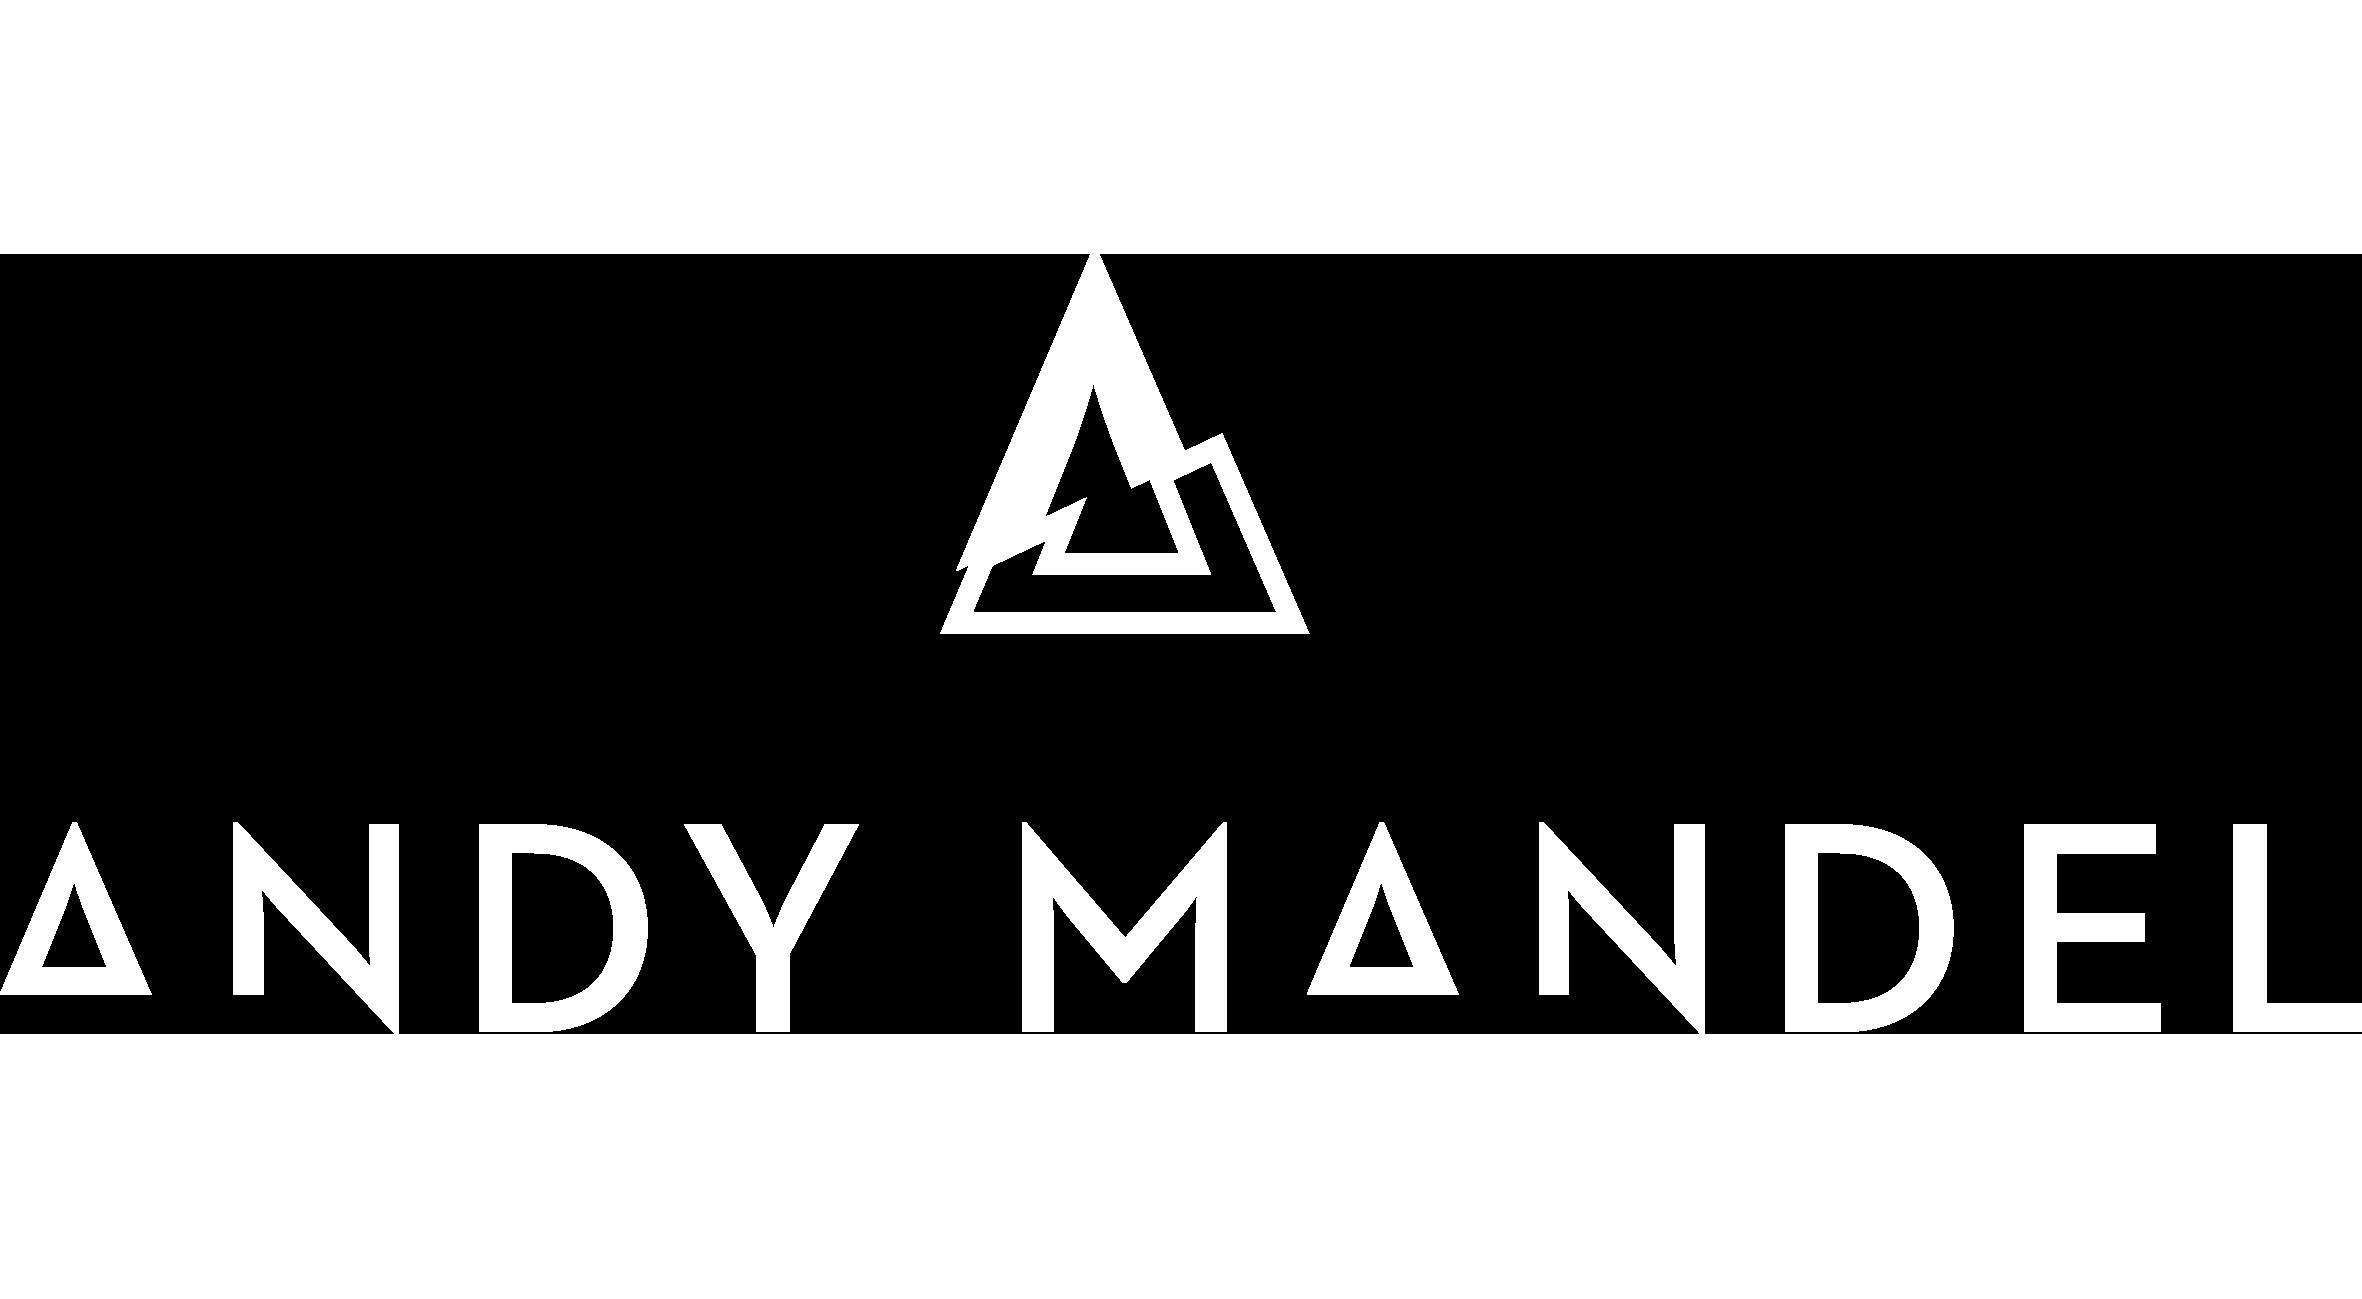 Andy Mandel